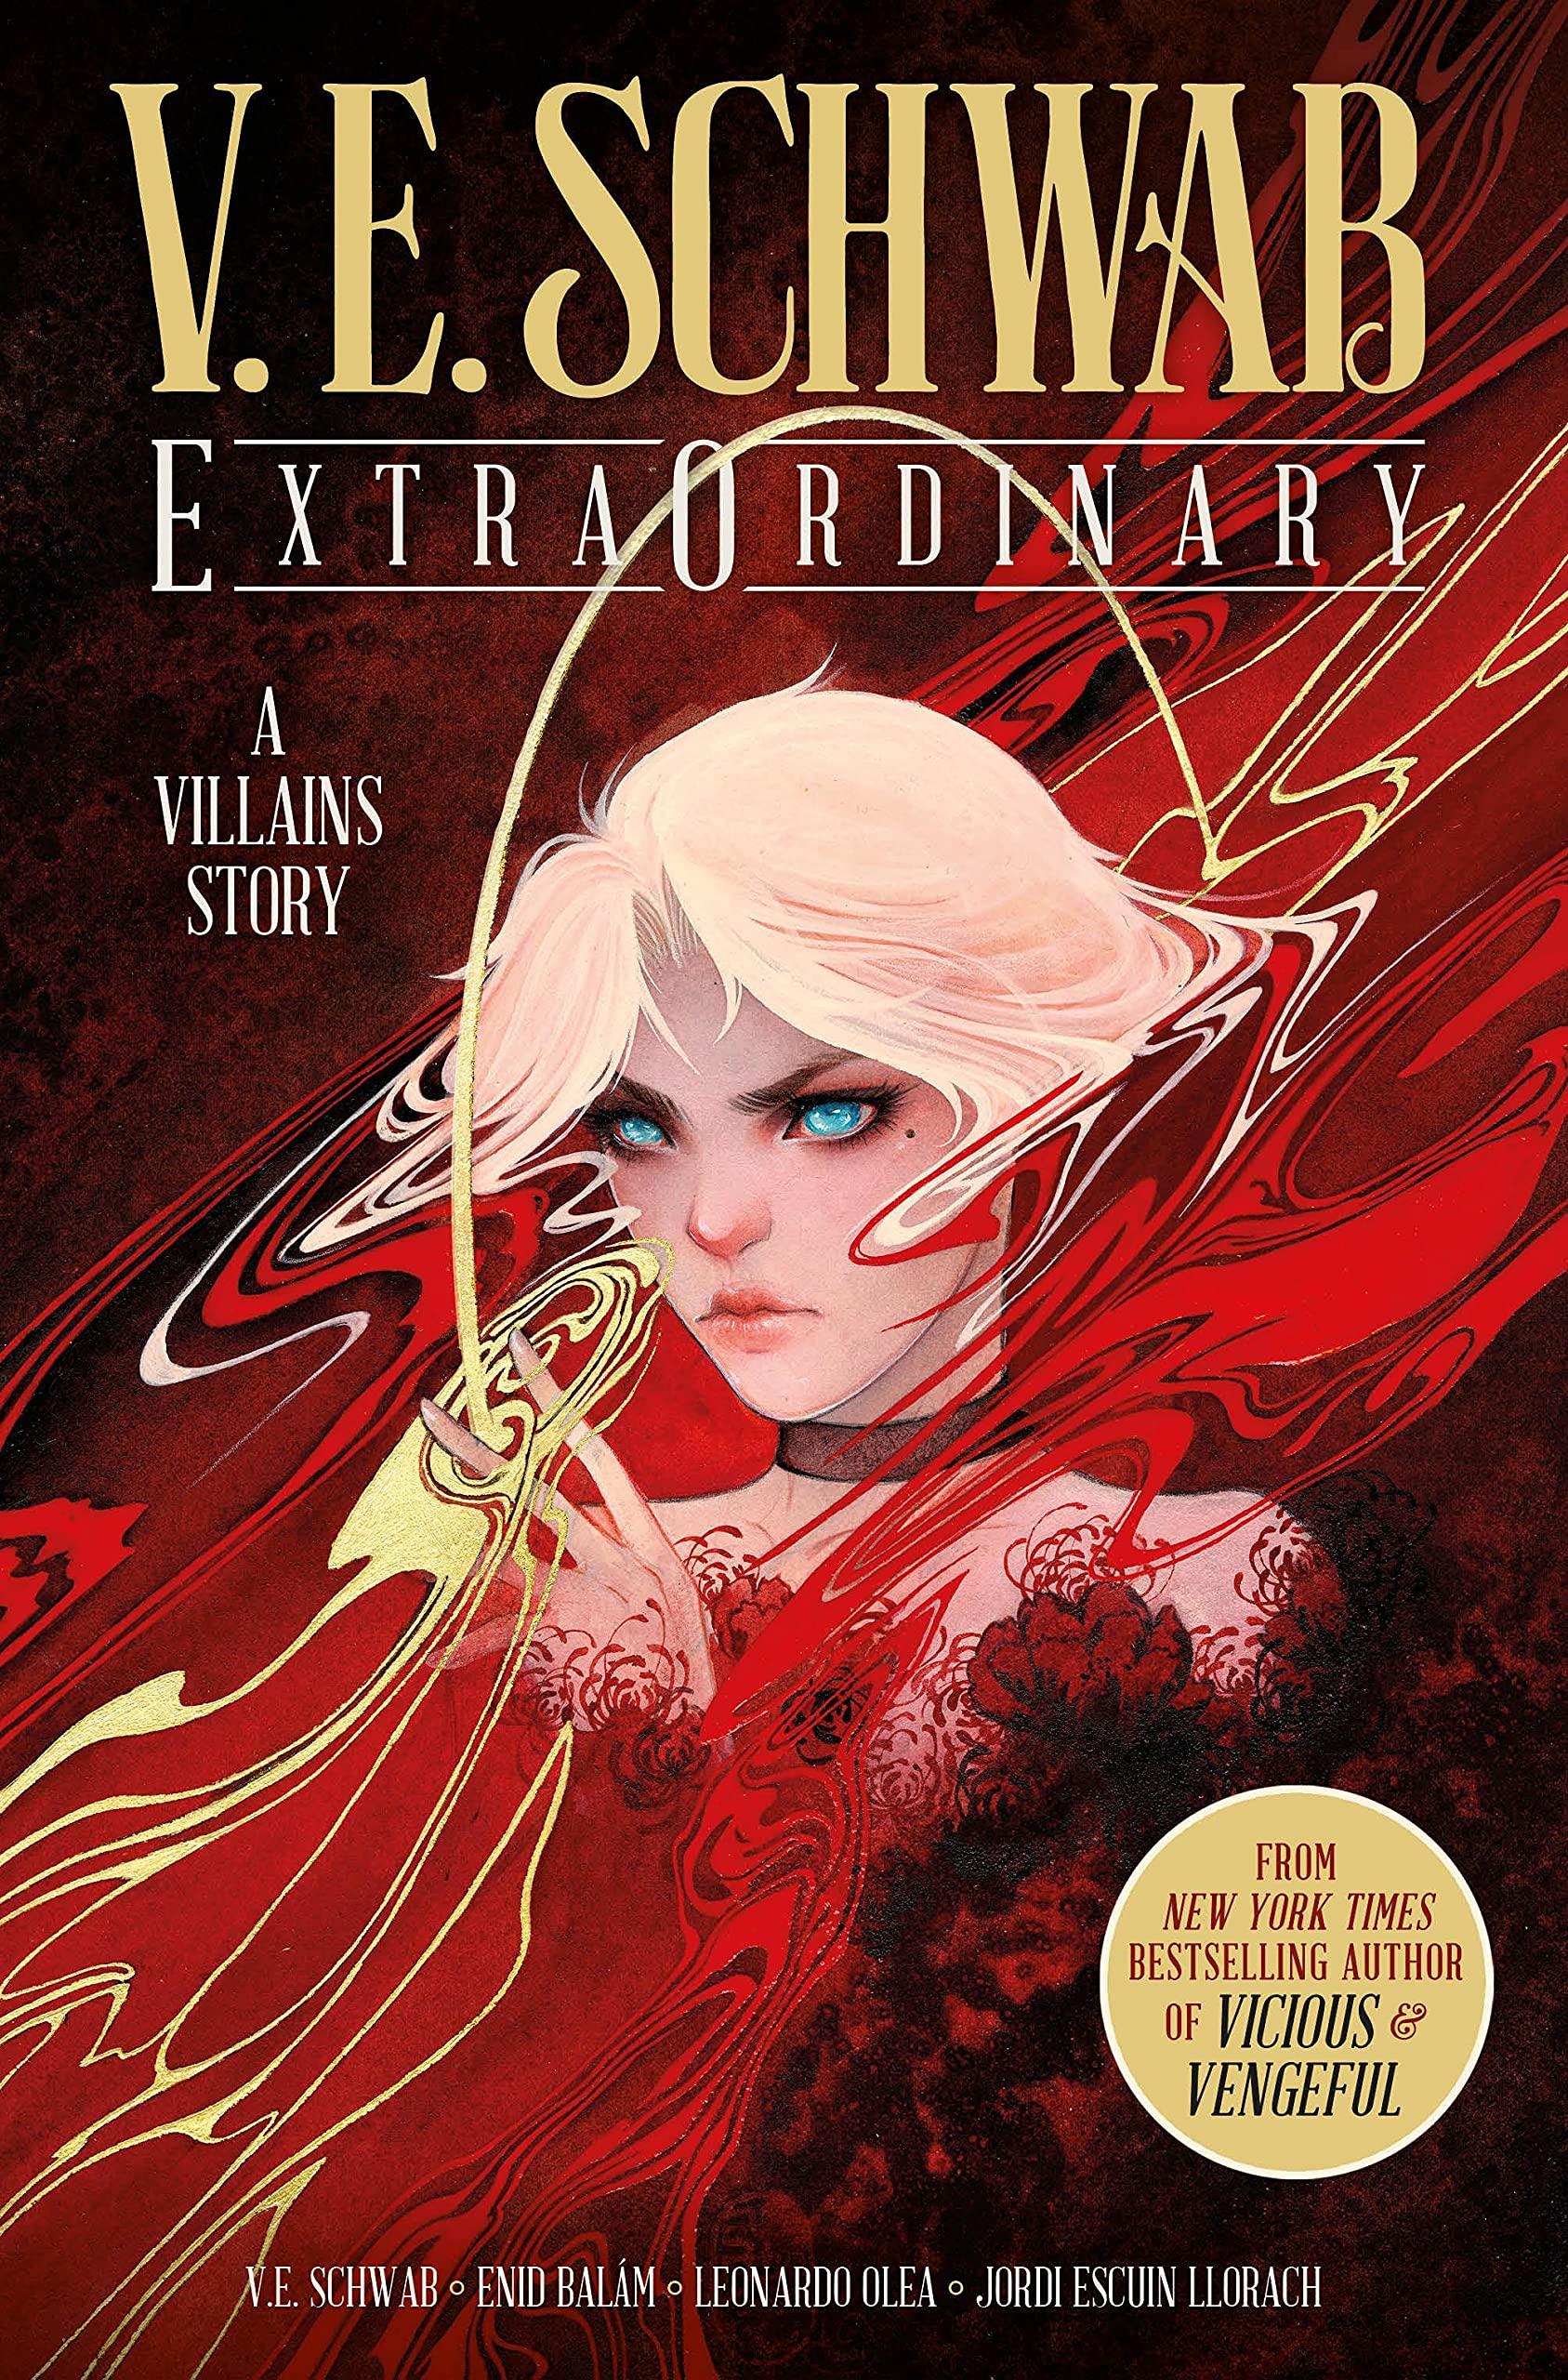 ExtraOrdinary: V.E. Schwab: Amazon.co.uk: Enid Balam, V.E. Schwab:  9781785865886: Books